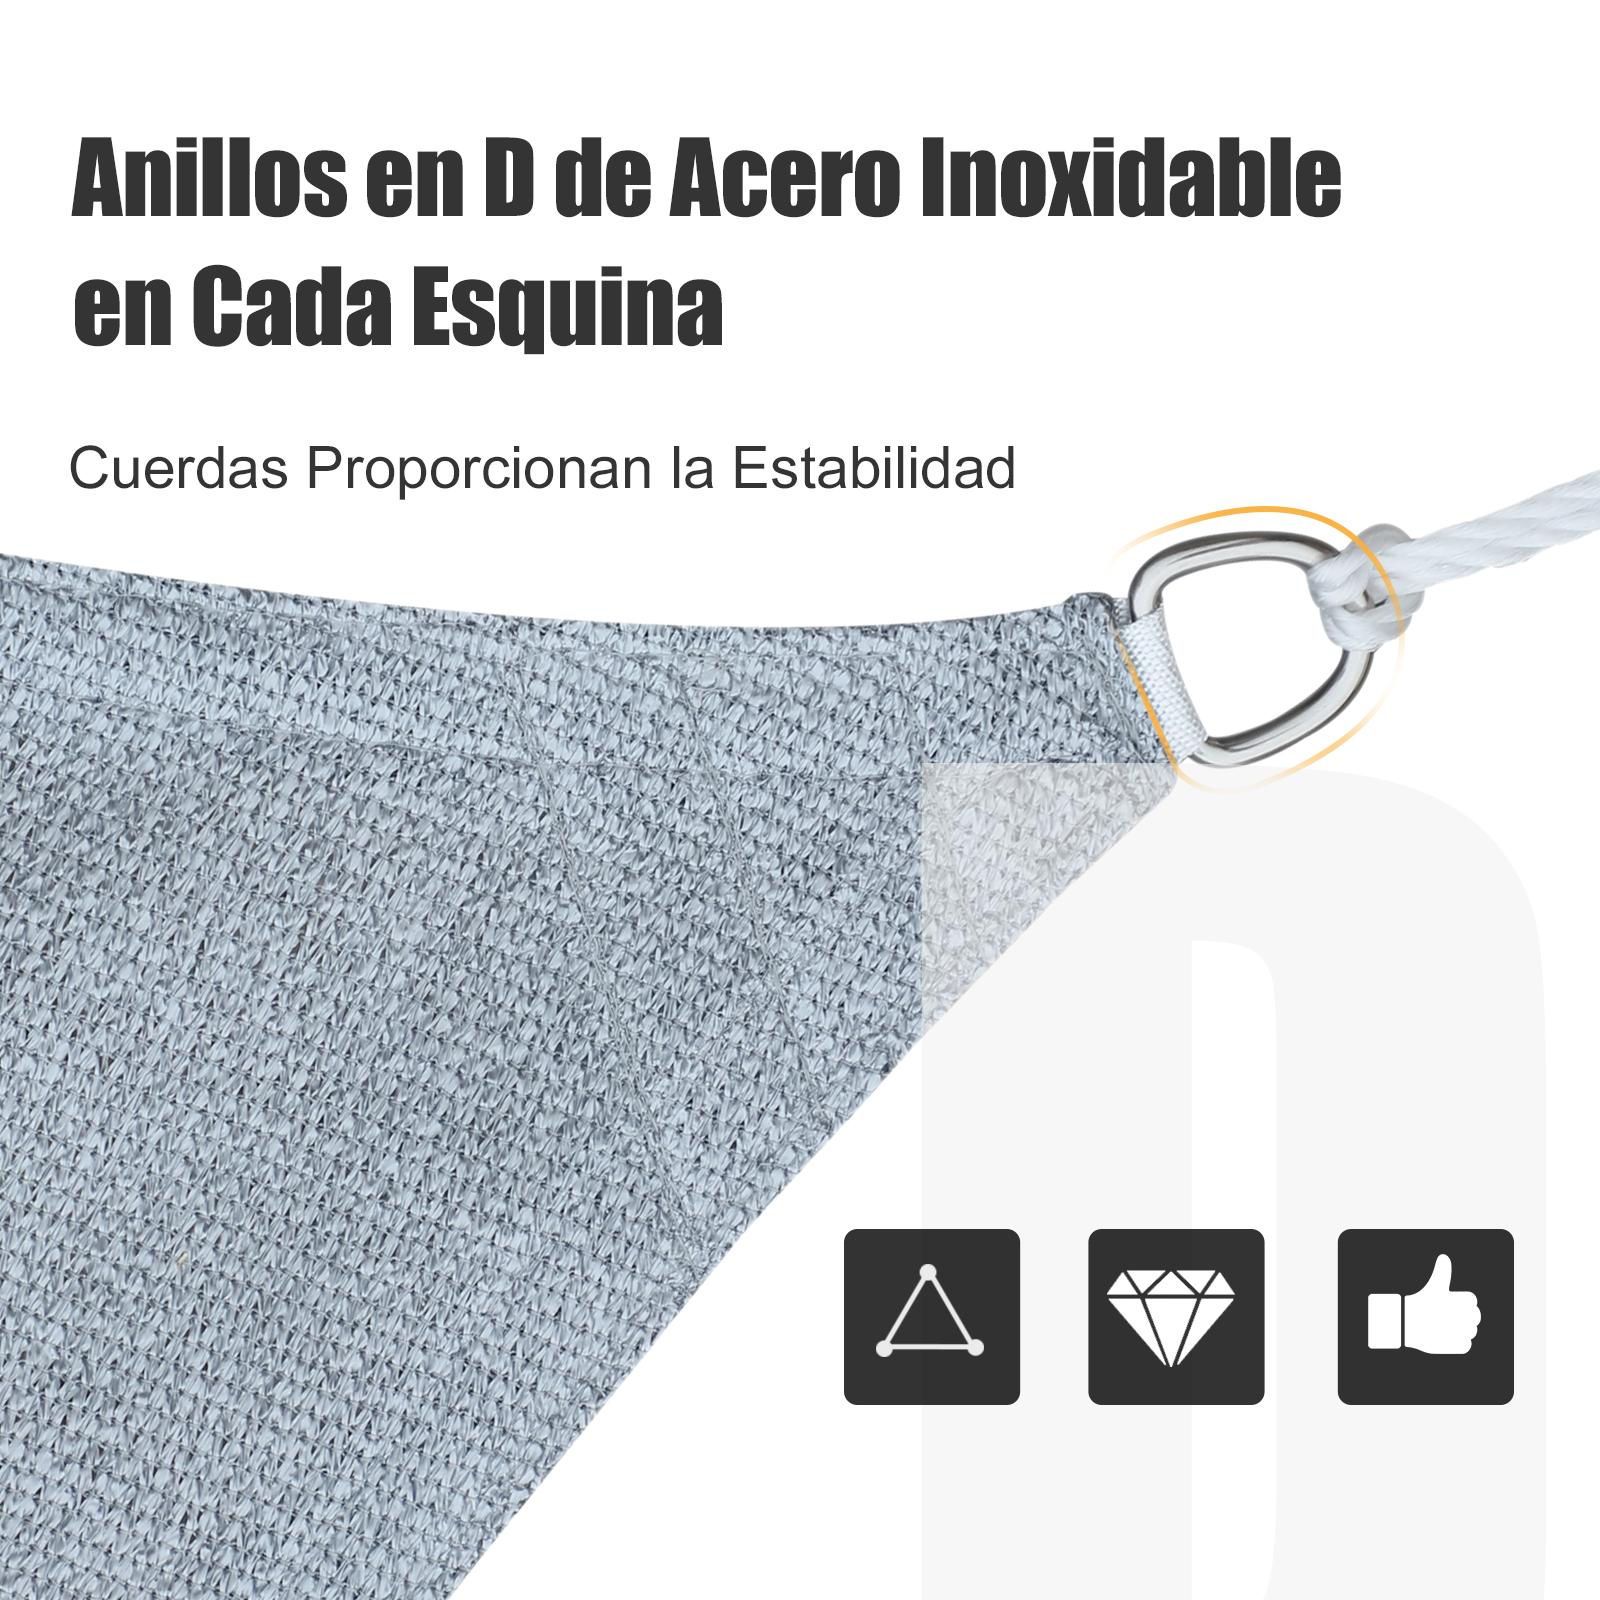 Toldo-Vela-Sombrilla-Parasol-Triangulo-Tejido-de-Poliester-185-g-m-Jardin-Playa miniatura 20